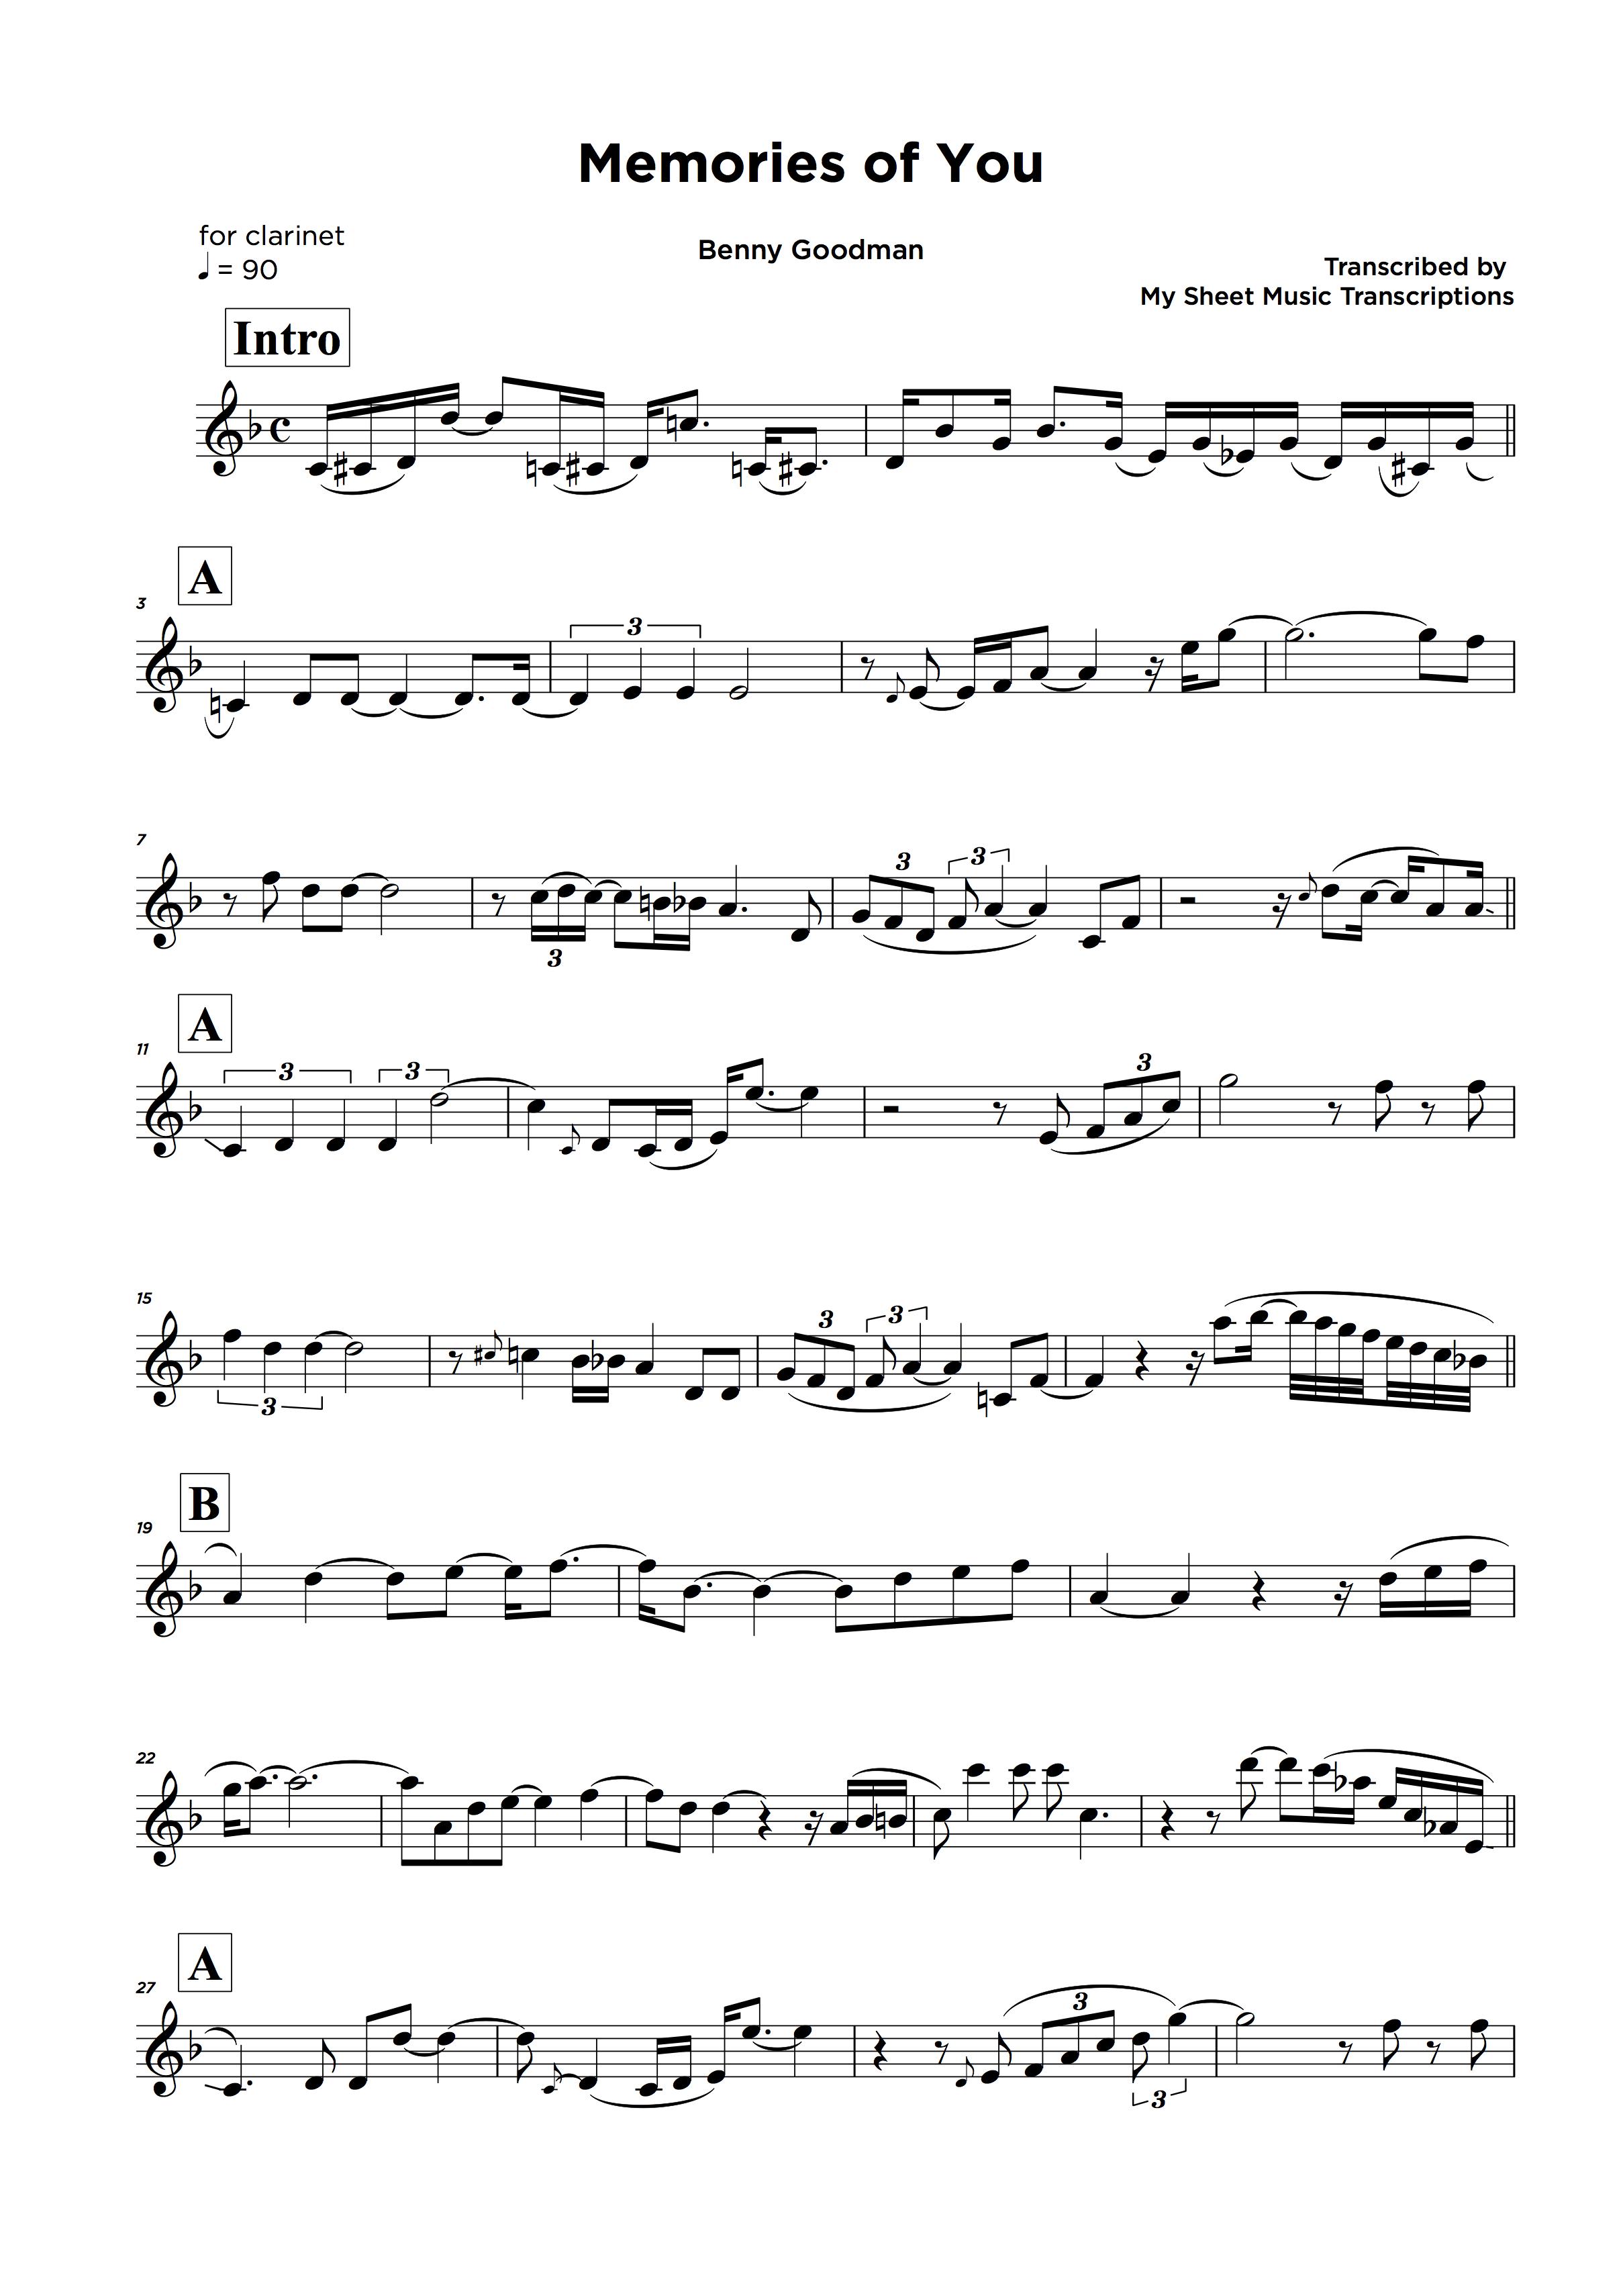 Lead sheet music transcription